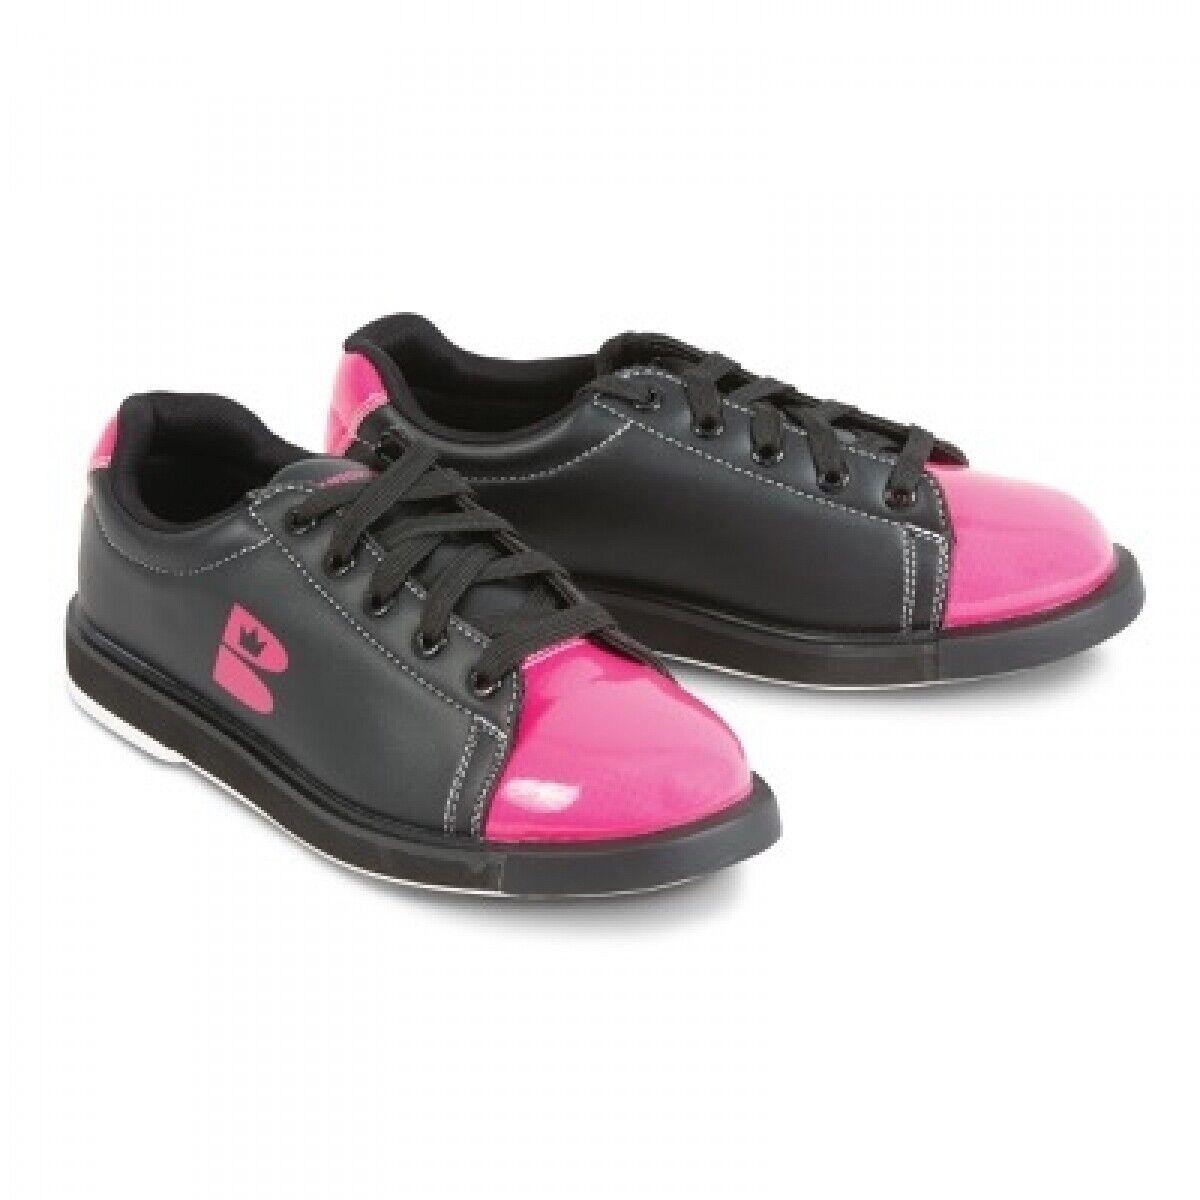 Brunswick Tzone - Black/Pink - Women's Bowling Shoes